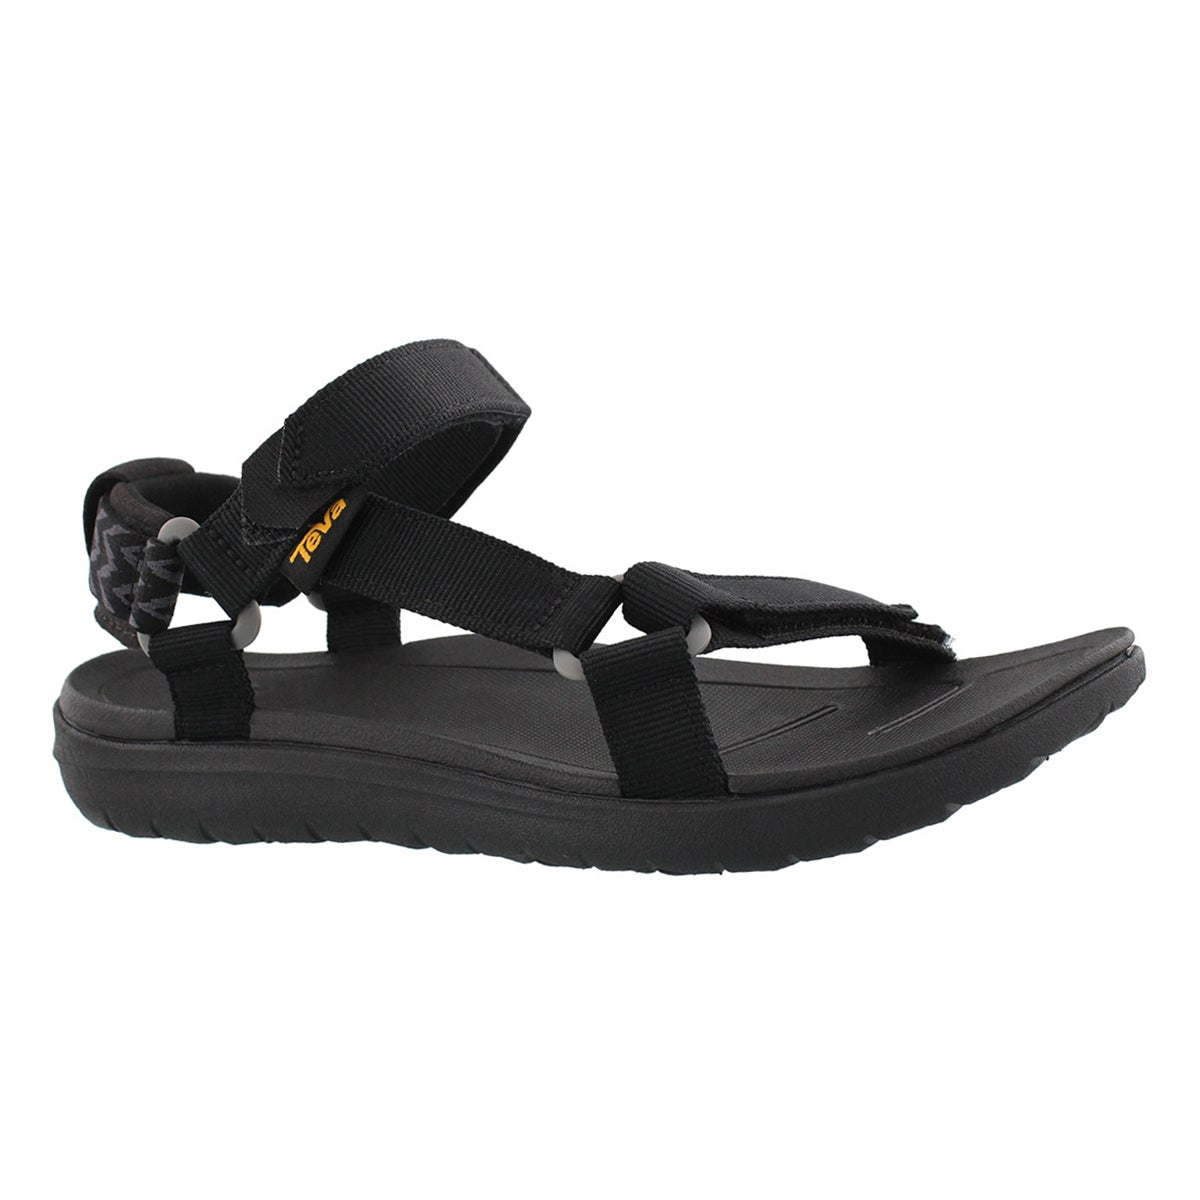 Lds Sanborn Universal black sport sandal